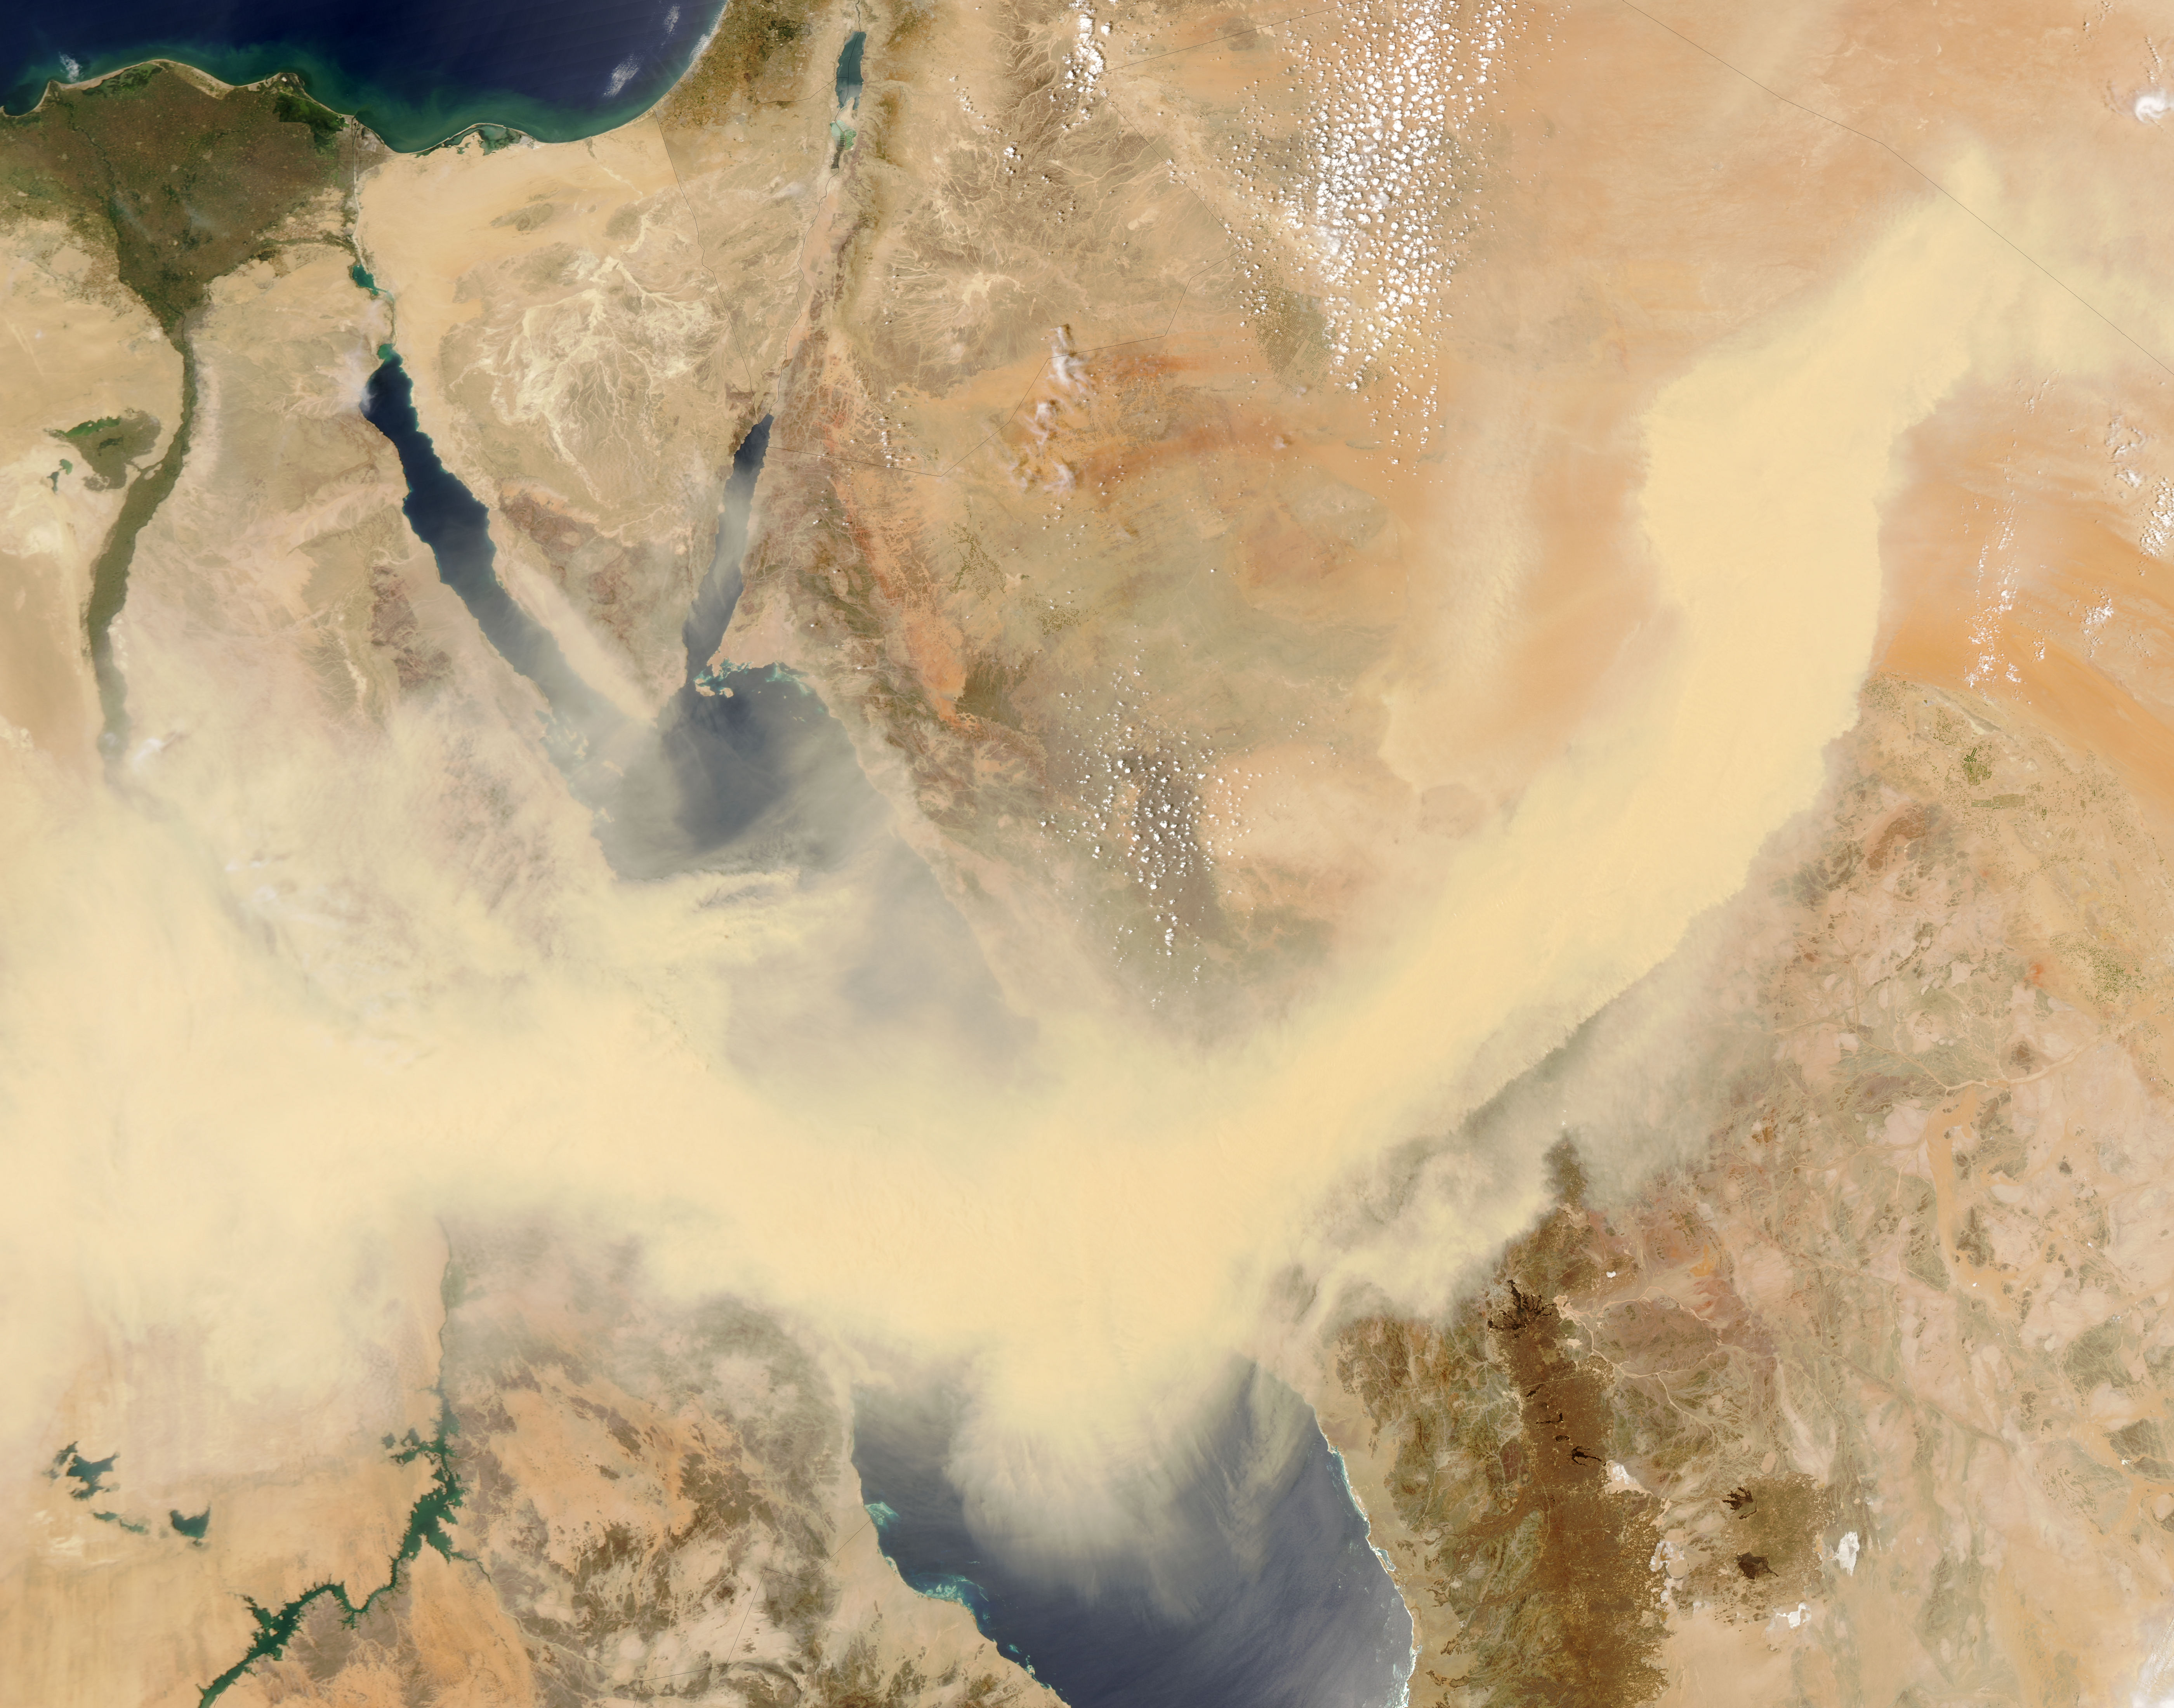 Sandstorm satellite image